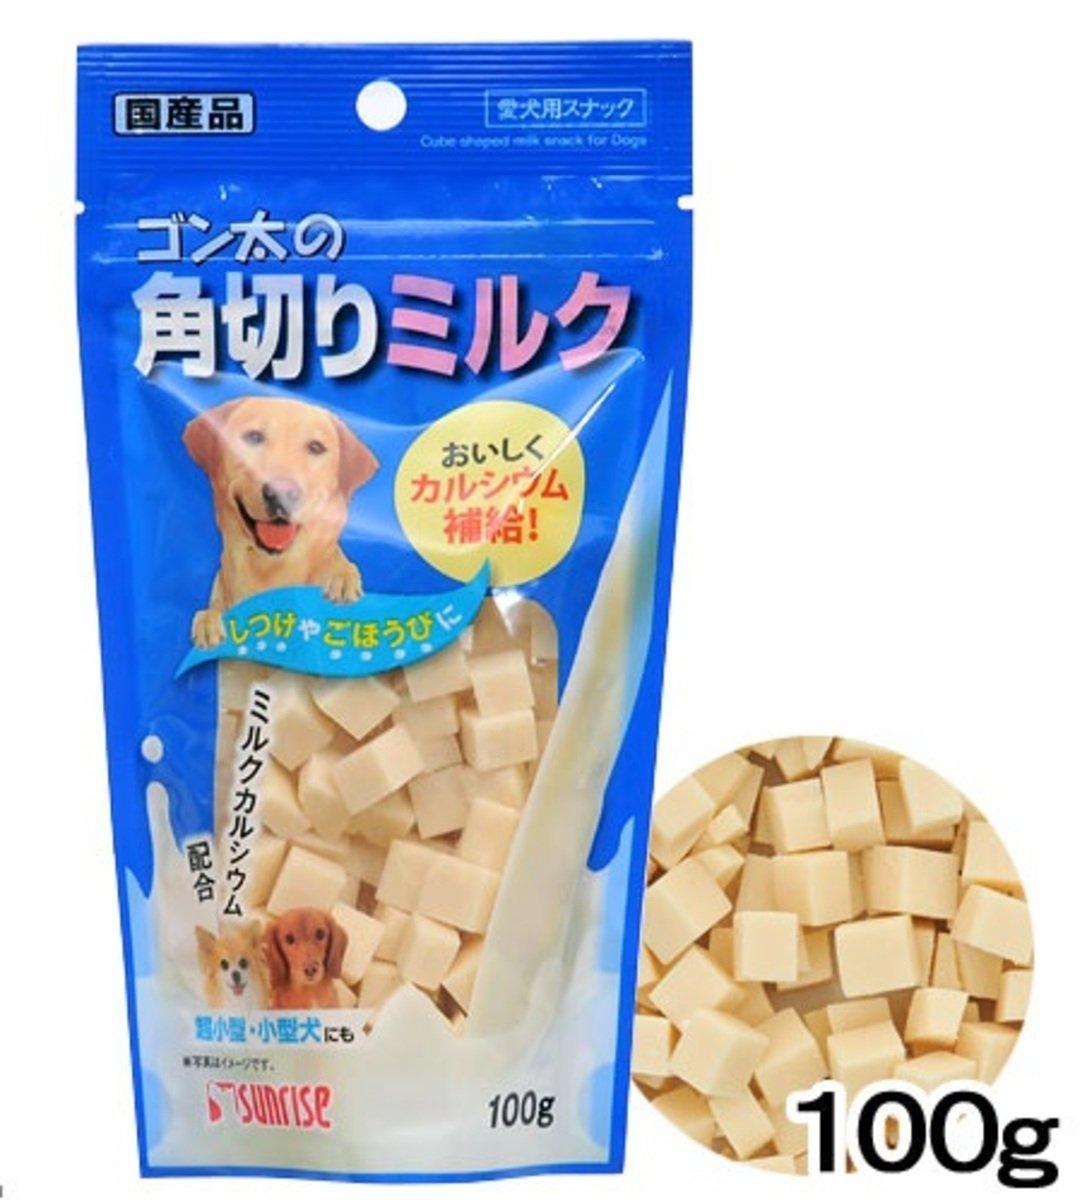 日本 SUNRISE 牛奶切粒 100g